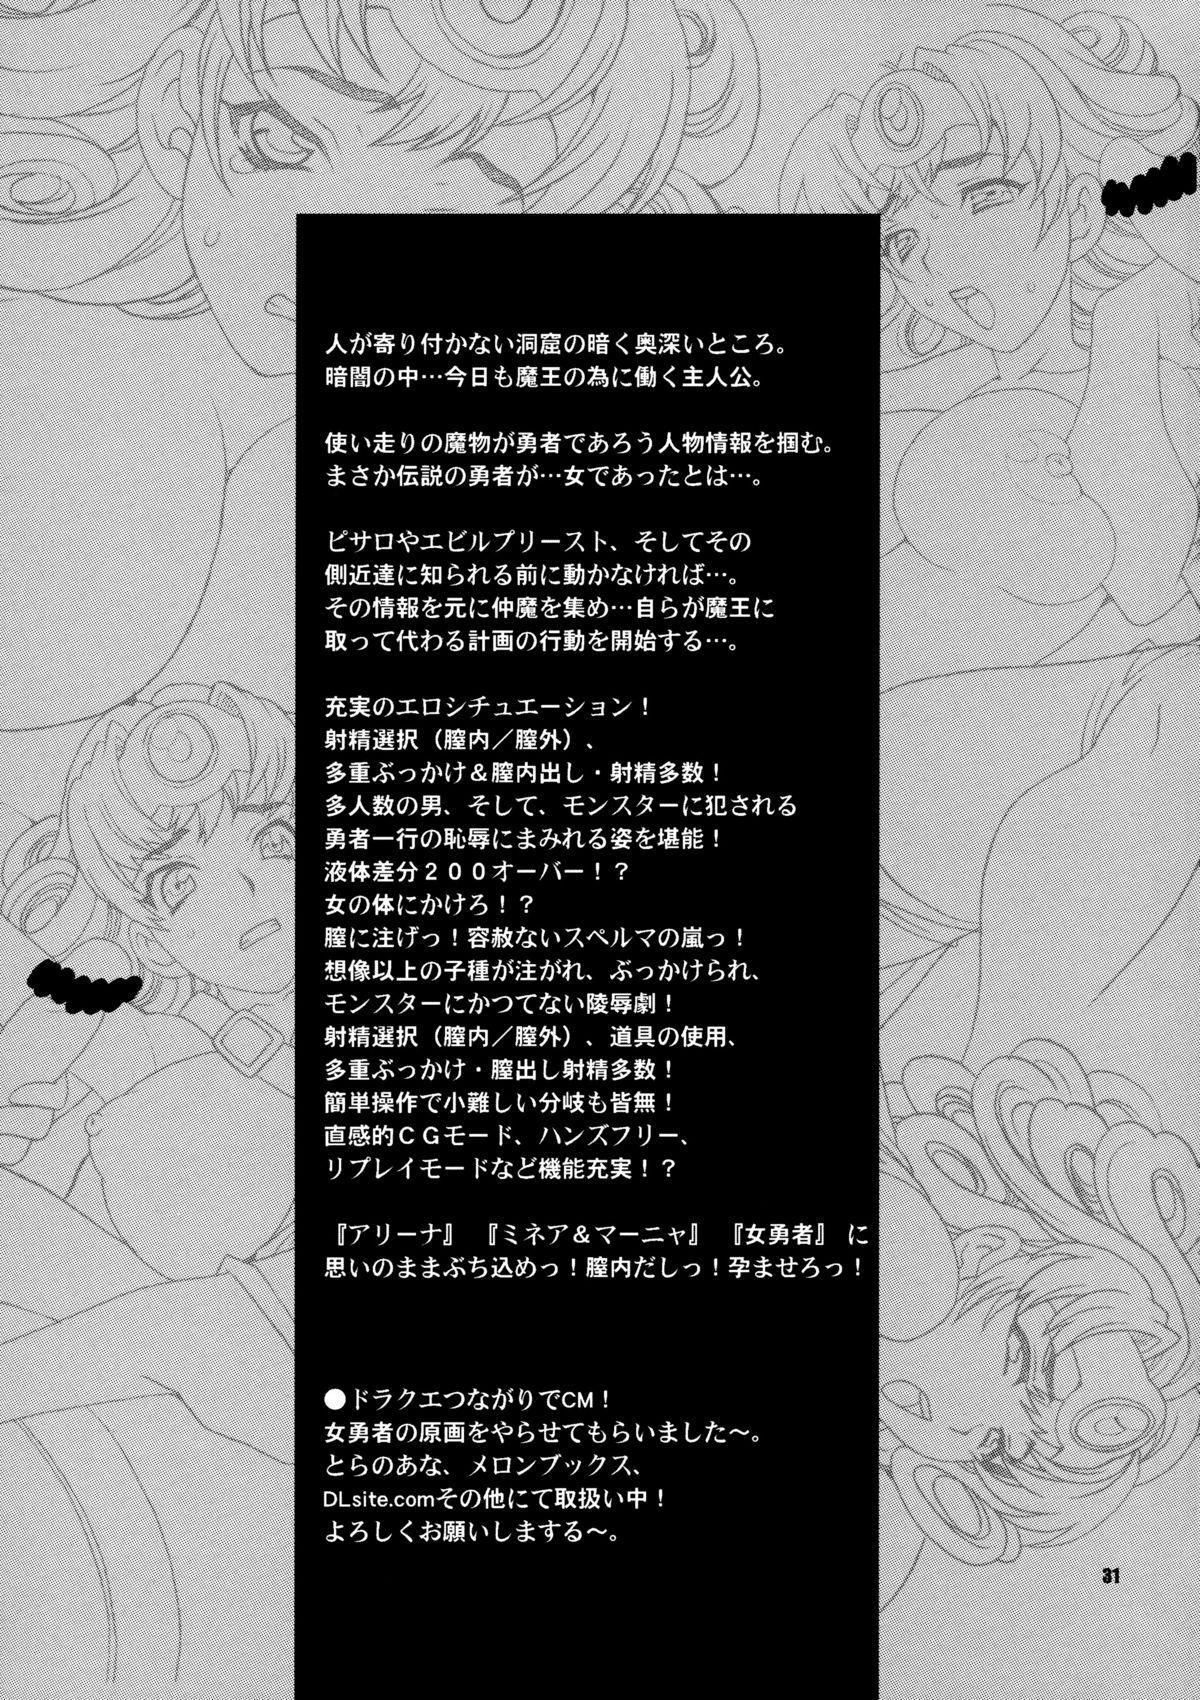 Onna Senshi to Sekai no Unmei | Female Warrior and Fate of the World 28